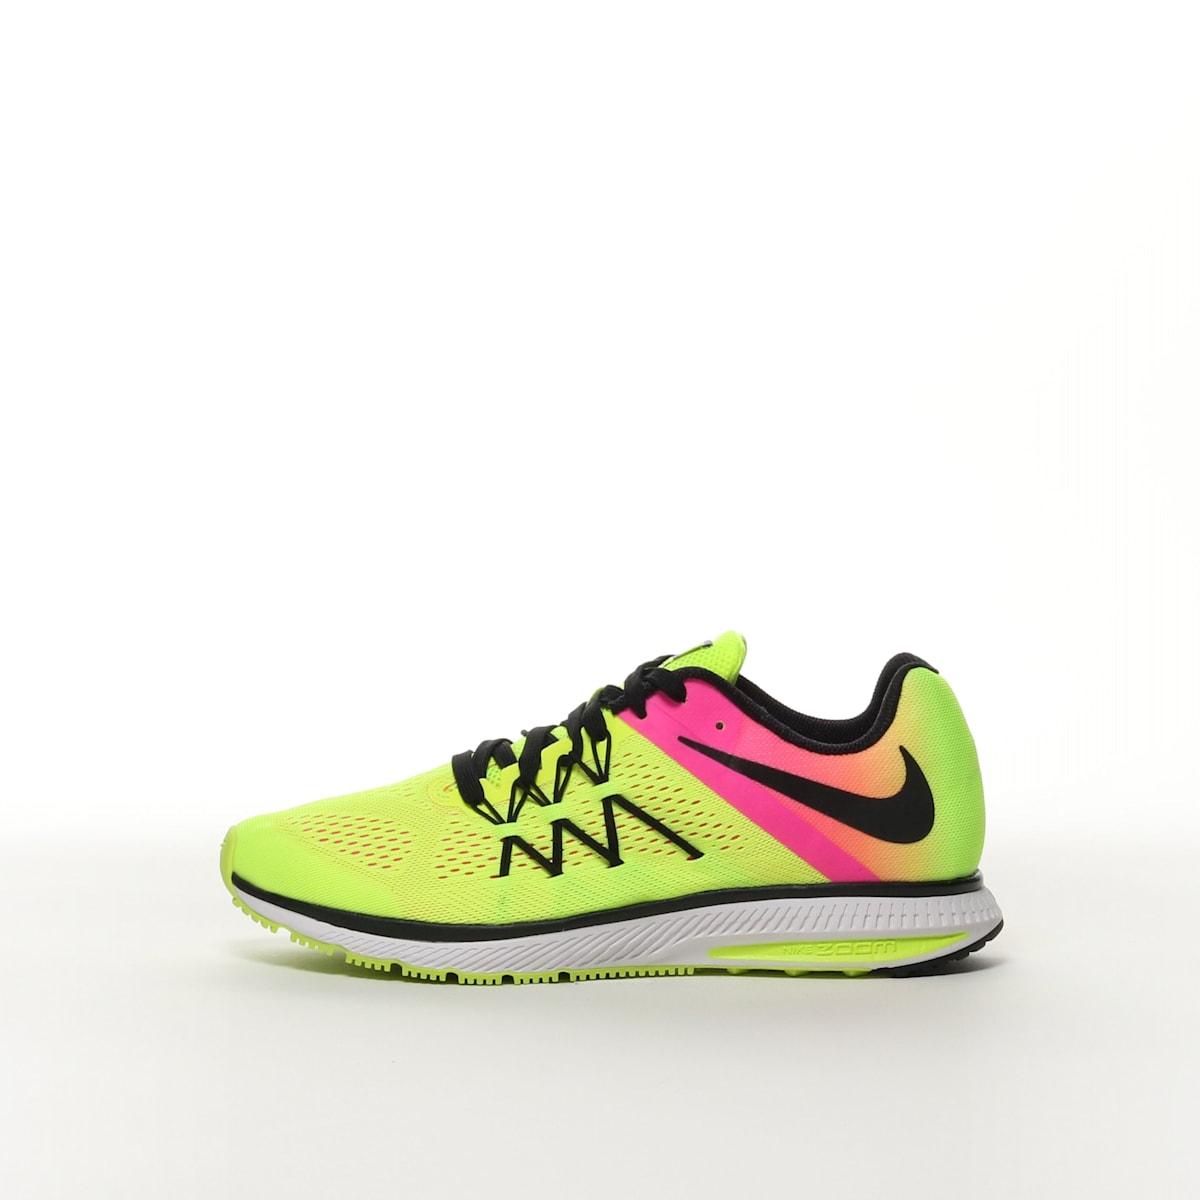 a46b2b3f7fb4 Men s Nike Zoom Winflo 3 OC Running Shoe - MLTCLR MLTCLR – Resku